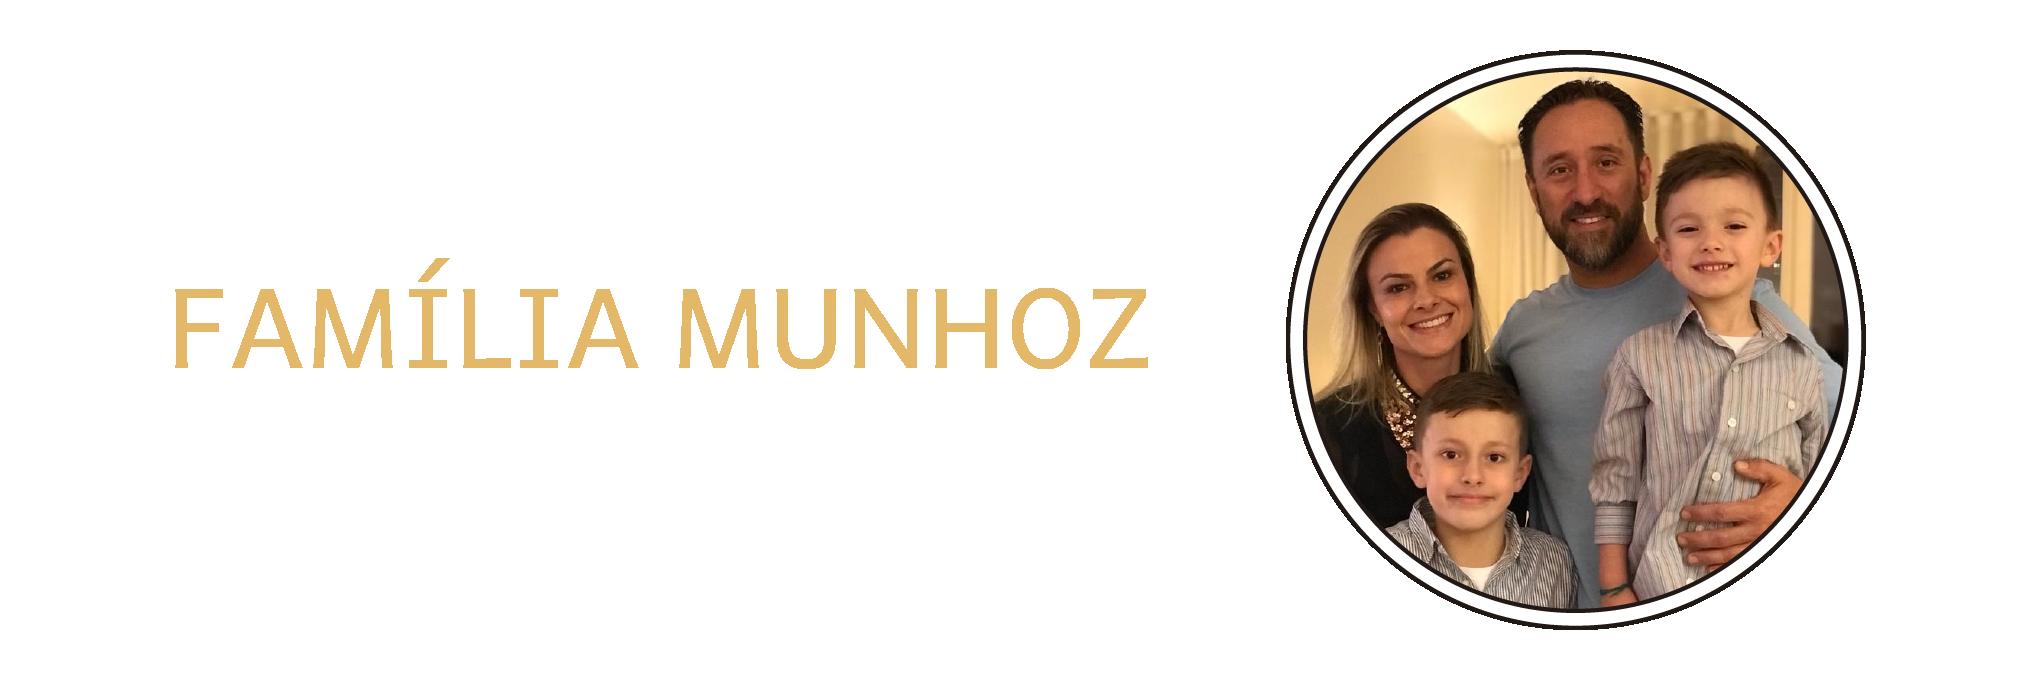 MUNHOZ_Prancheta 1